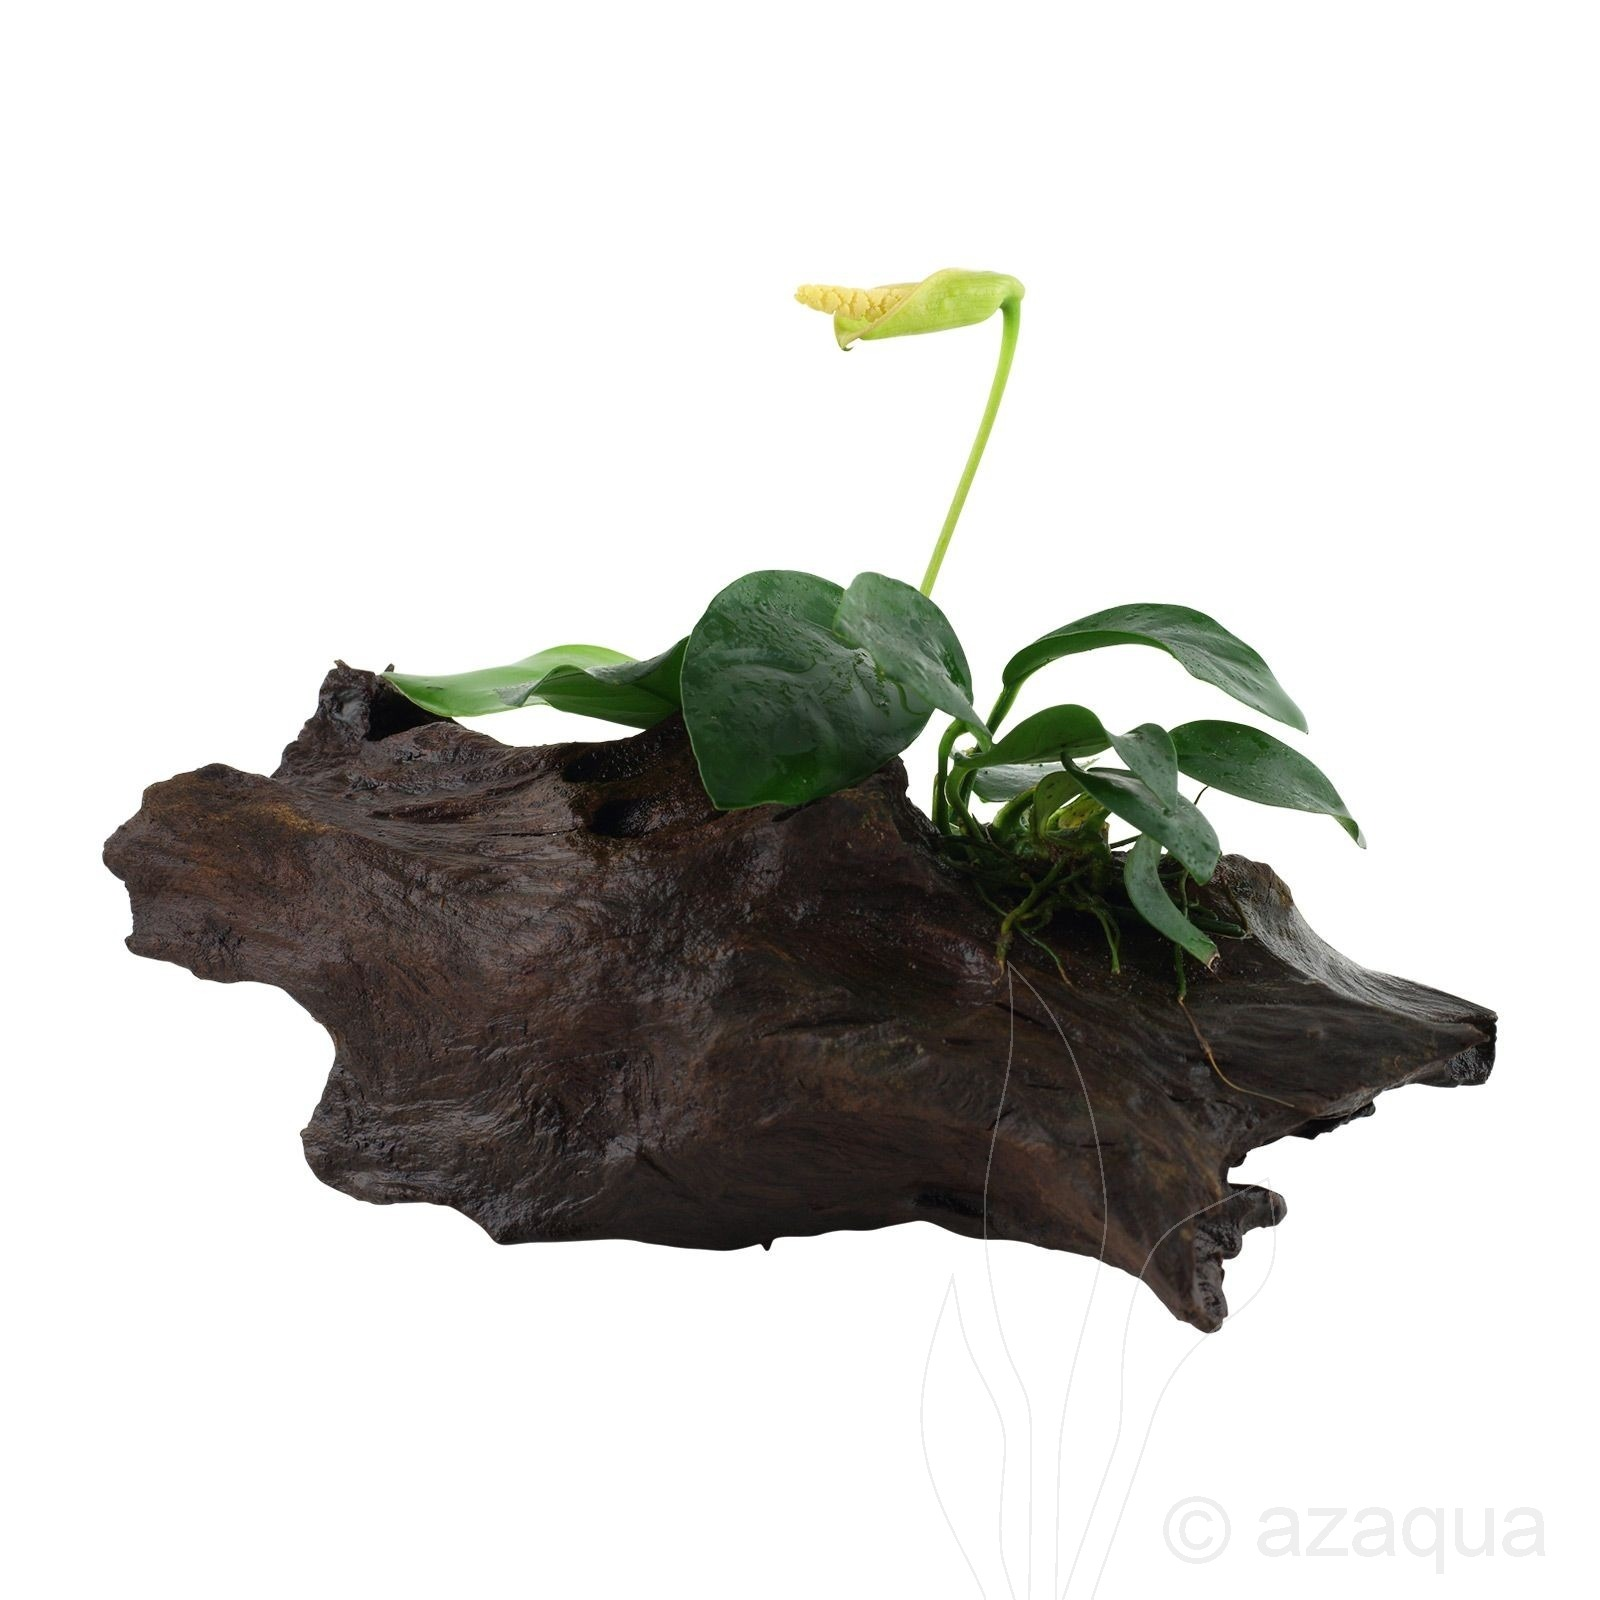 Anubias barteri var. nana on wood